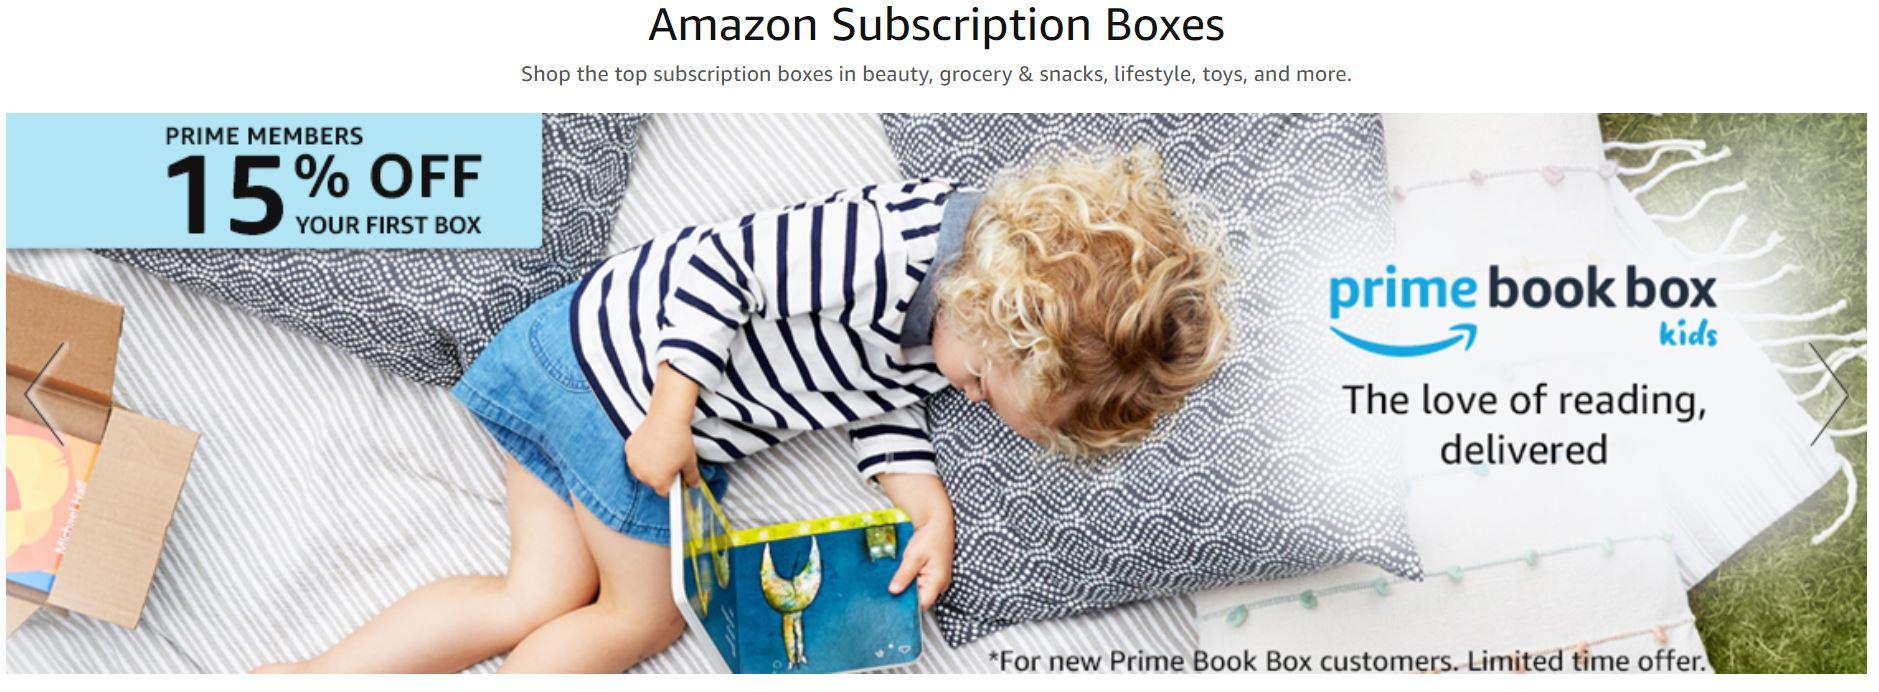 Amazon's subscription boxes